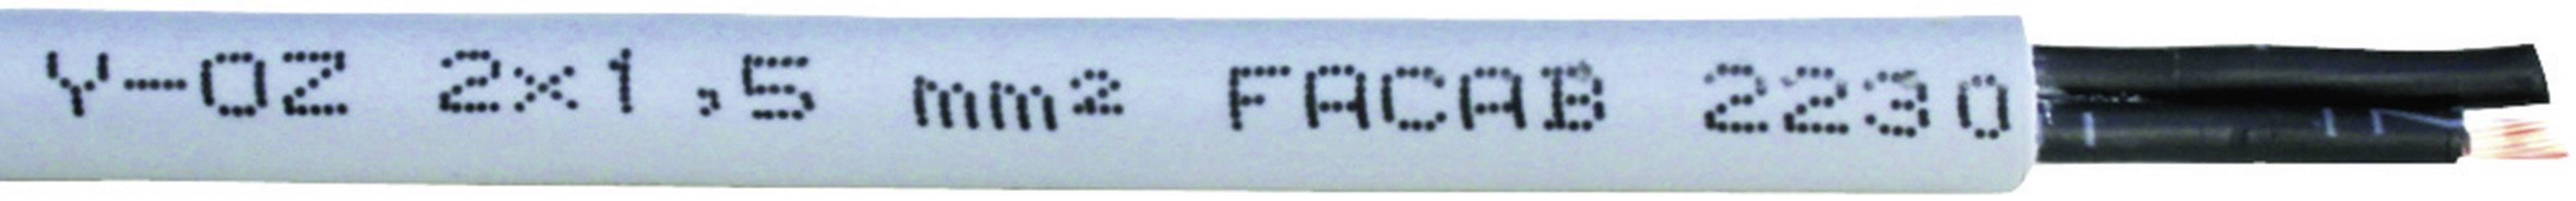 Riadiaci kábel Faber Kabel YSLY-OZ 030548, 4 x 0.75 mm², vonkajší Ø 6.40 mm, 500 V, metrový tovar, sivá